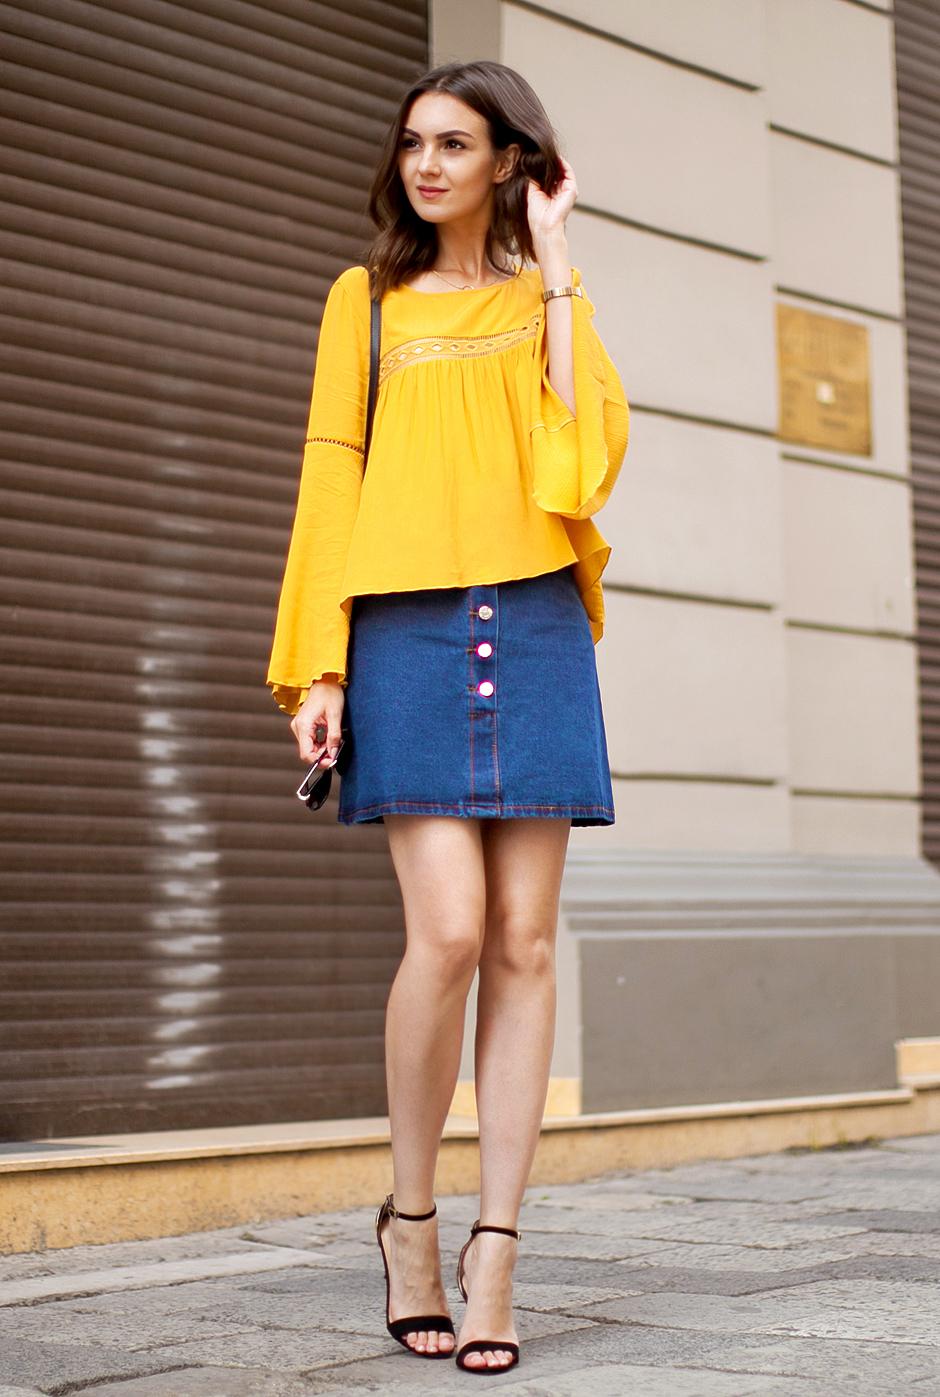 denim-skirt-70s-fashion-blog-daily-outfits